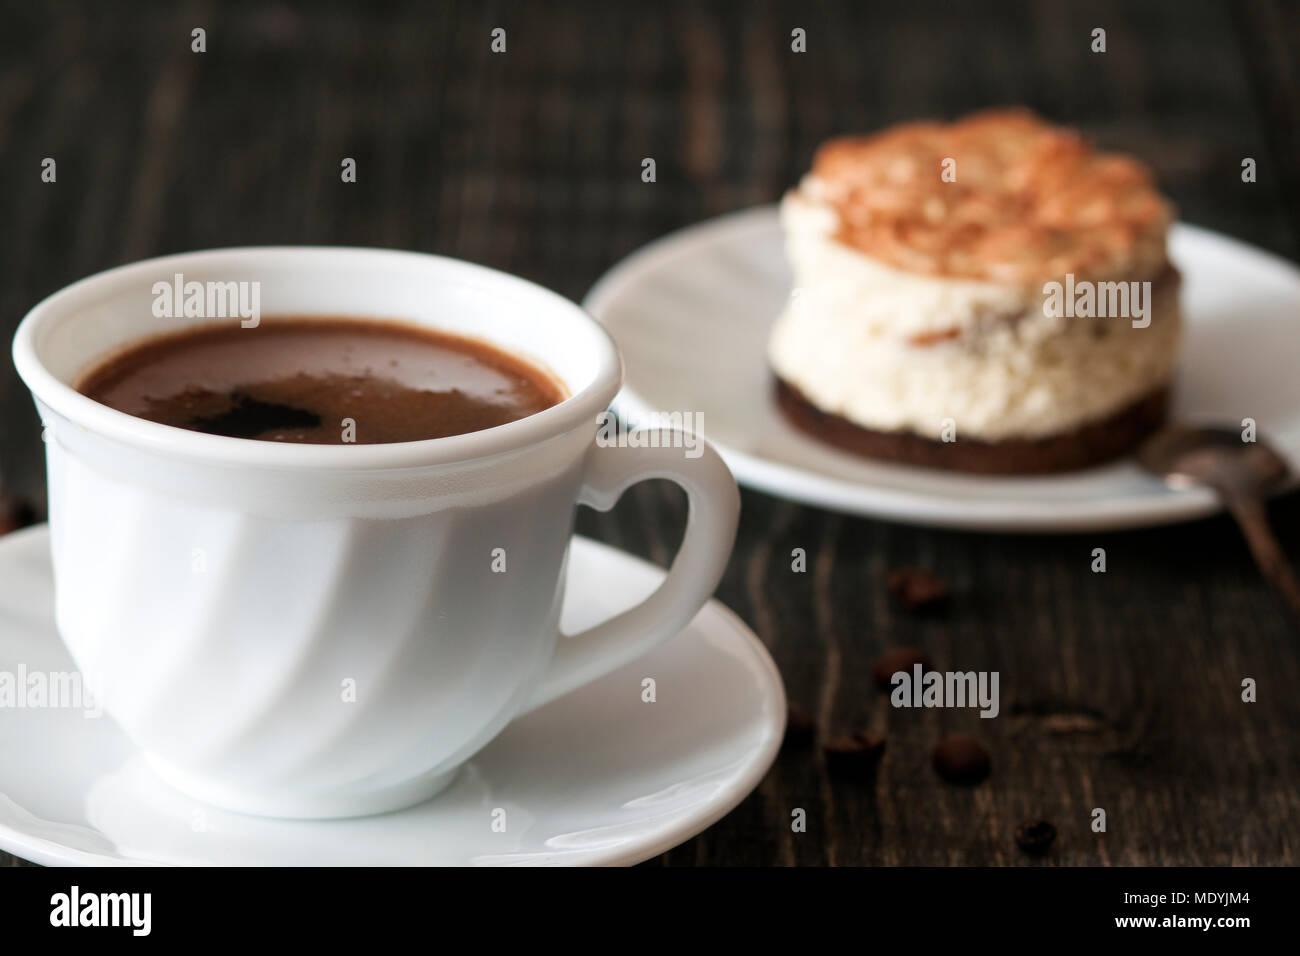 a cup of coffee and tiramisu Stock Photo